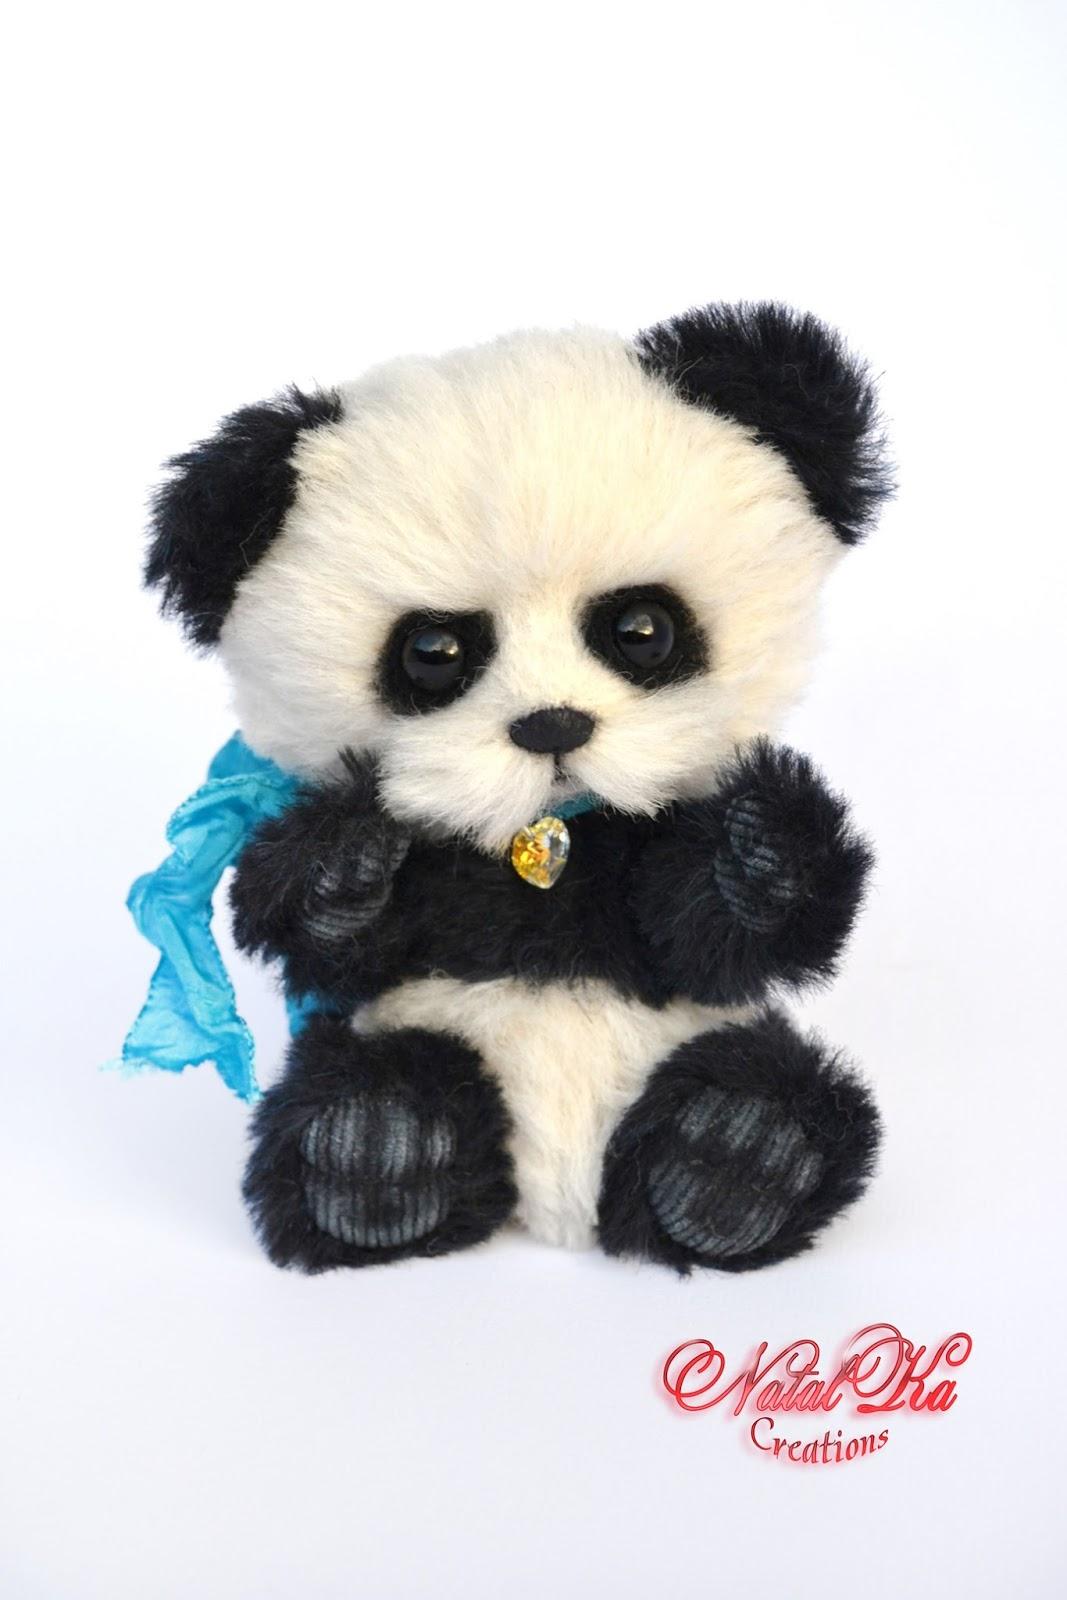 Artist teddy bear, artist bear, panda, handmade, ooak, alpaca, jointed, teddy, teddies by NatalKa Creations. Künstlerbär, Teddybär, Teddy, Künstlerteddy, Panda, Unikat, handgemacht von NatalKa Creations.